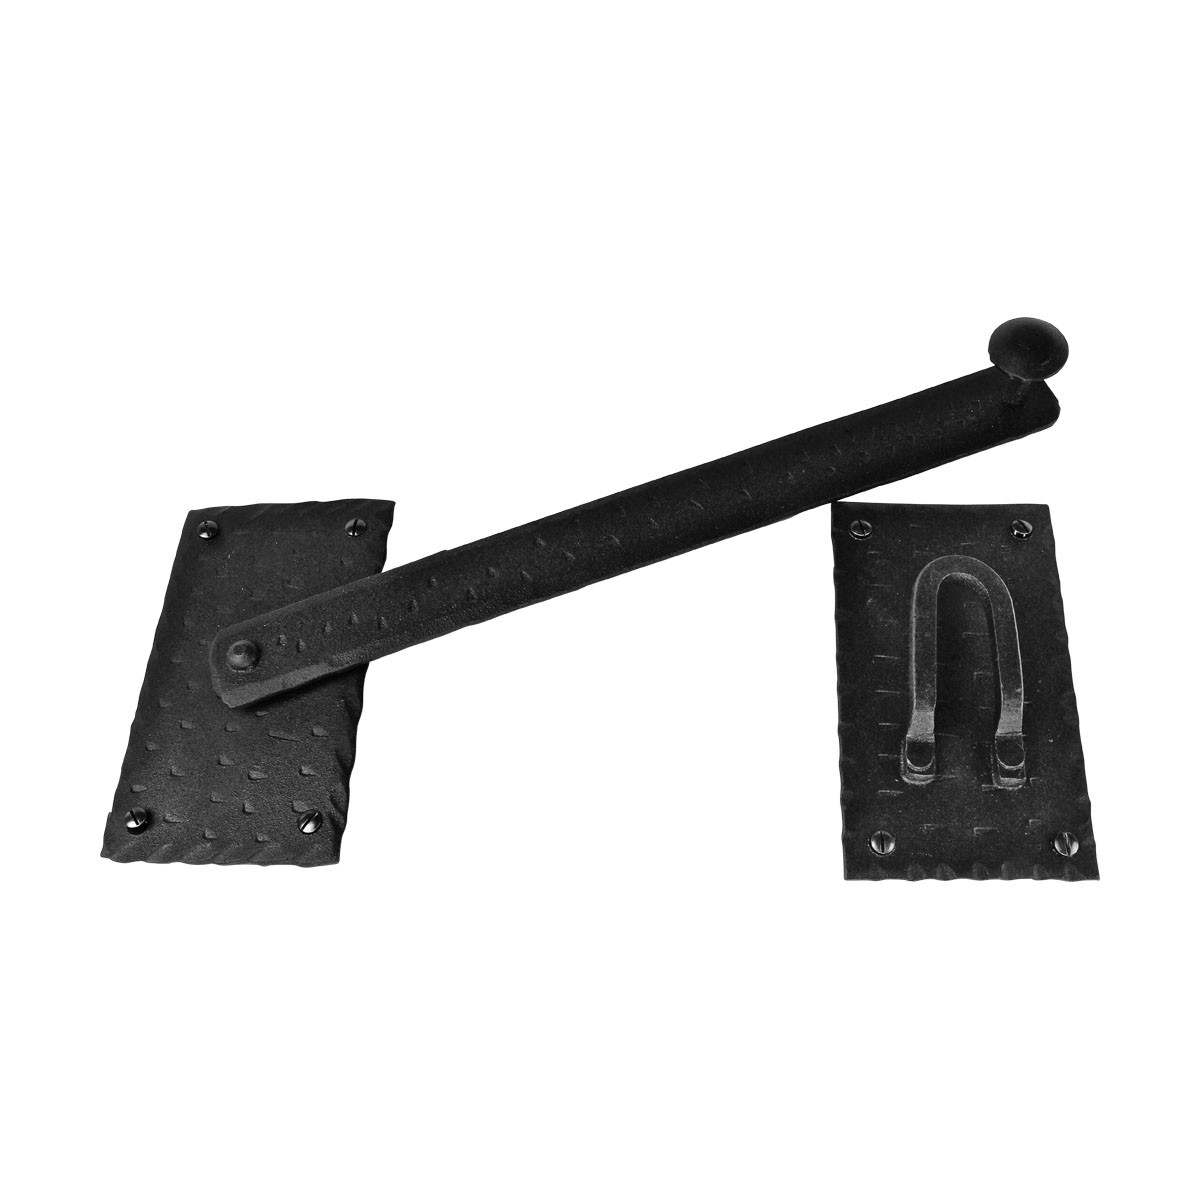 Lift Gate Latch Lock Black Wrought Iron Gate Latch 12 Inch Gate Latches Gate Latch Lock Wrought Iron Gate Latches